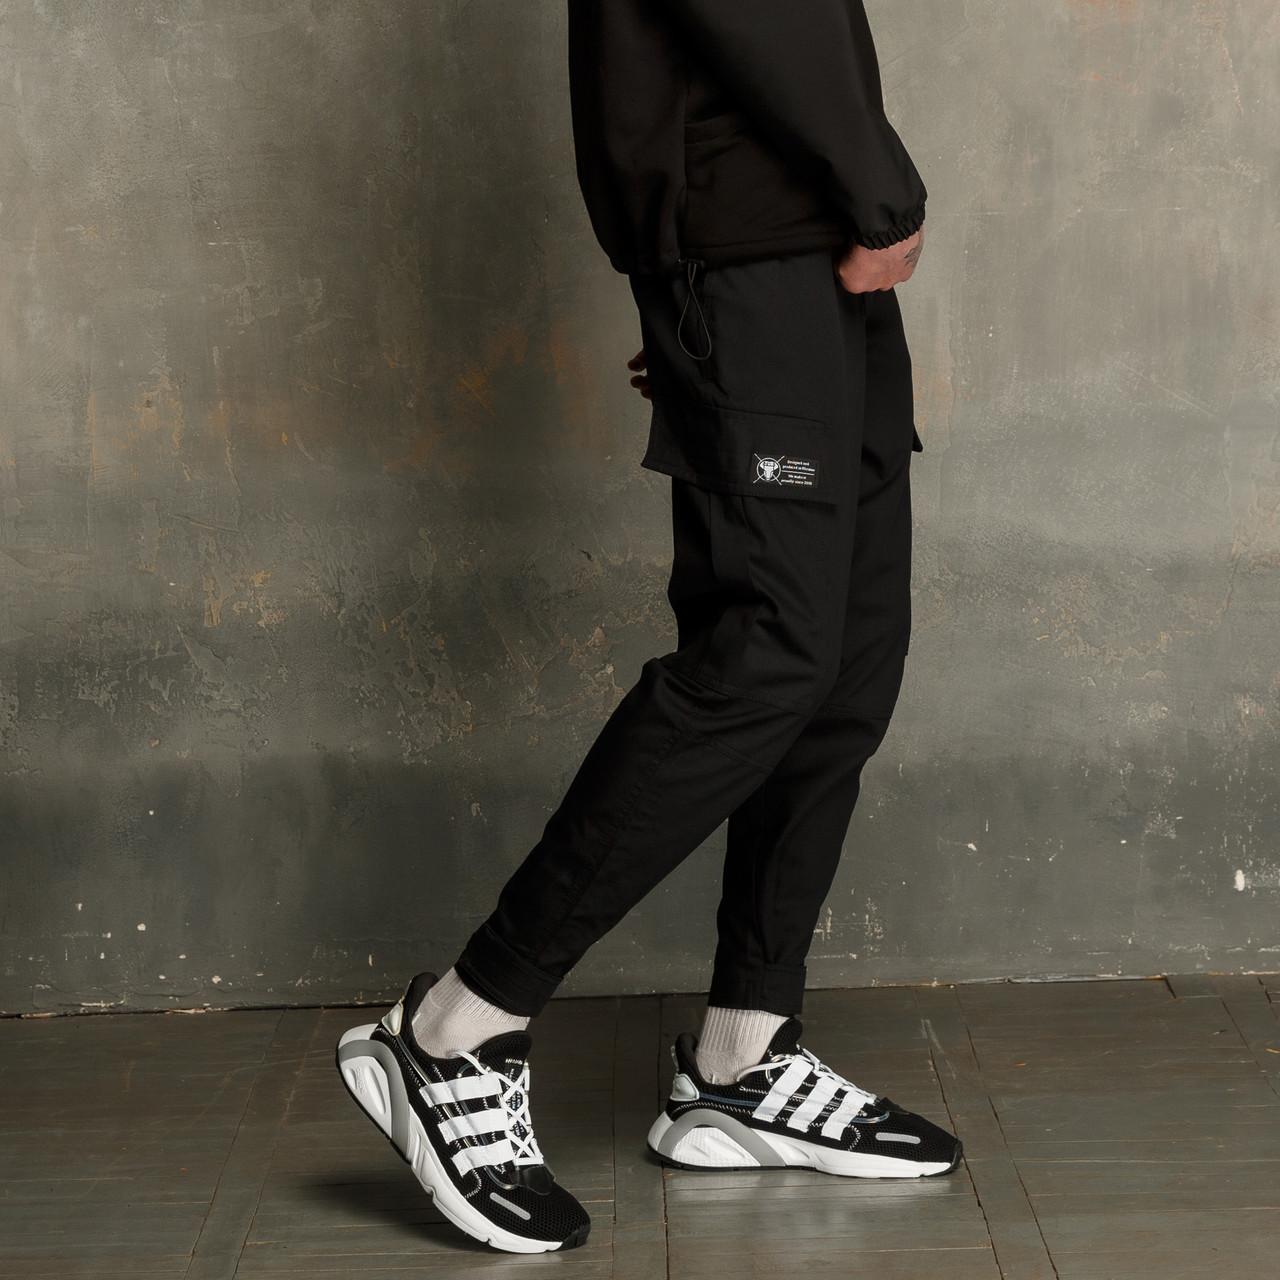 Штаны карго мужские черные бренд ТУР модель Карнаж (Carnage)